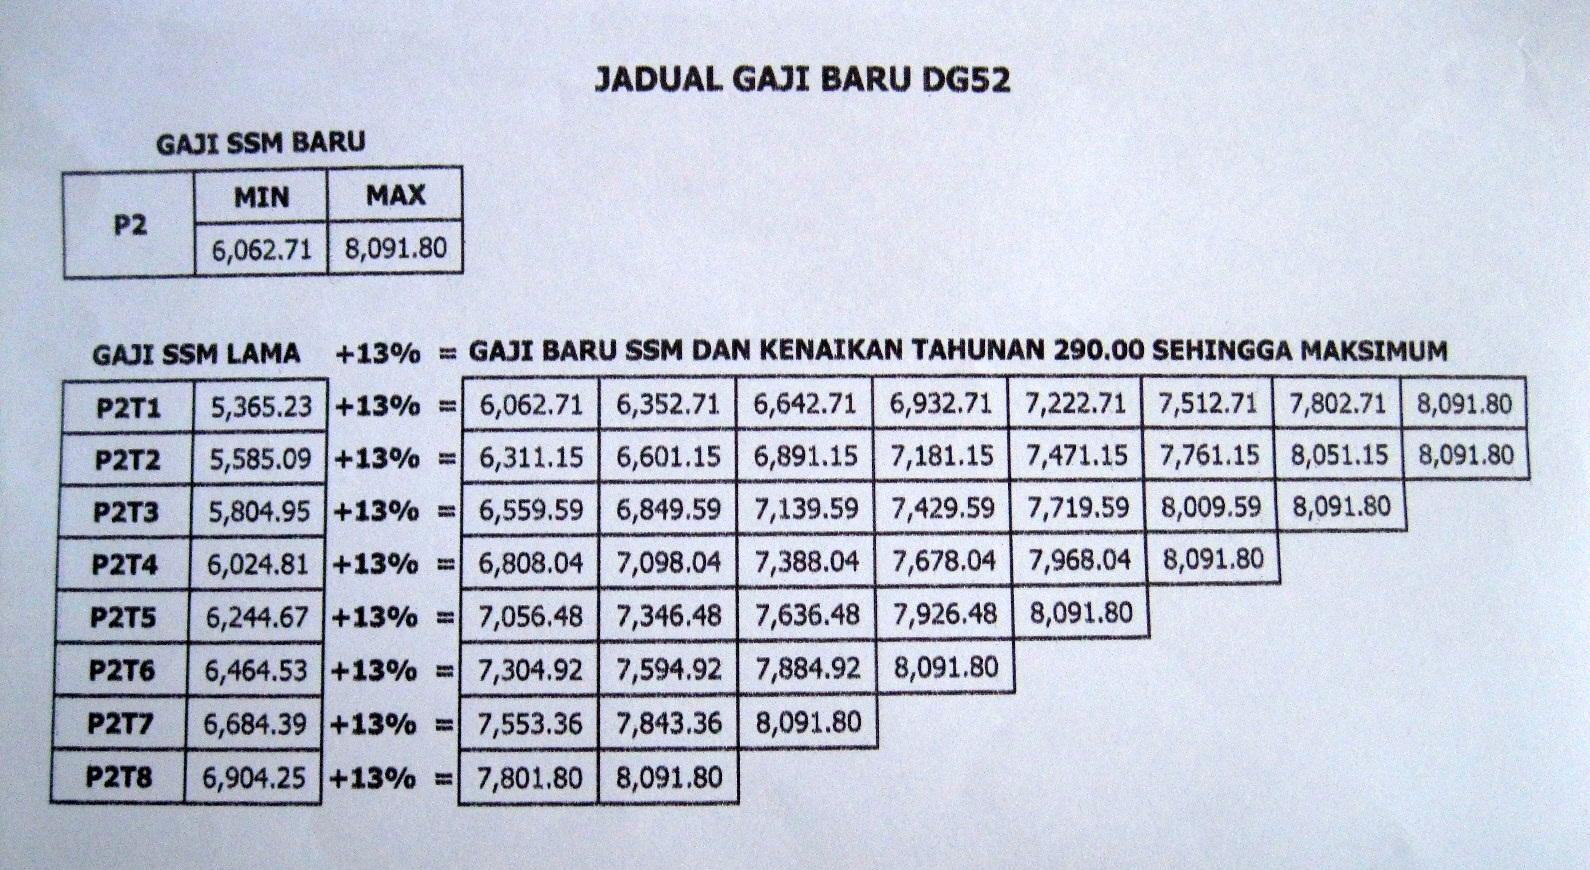 Jadual Gaji DG52 P2